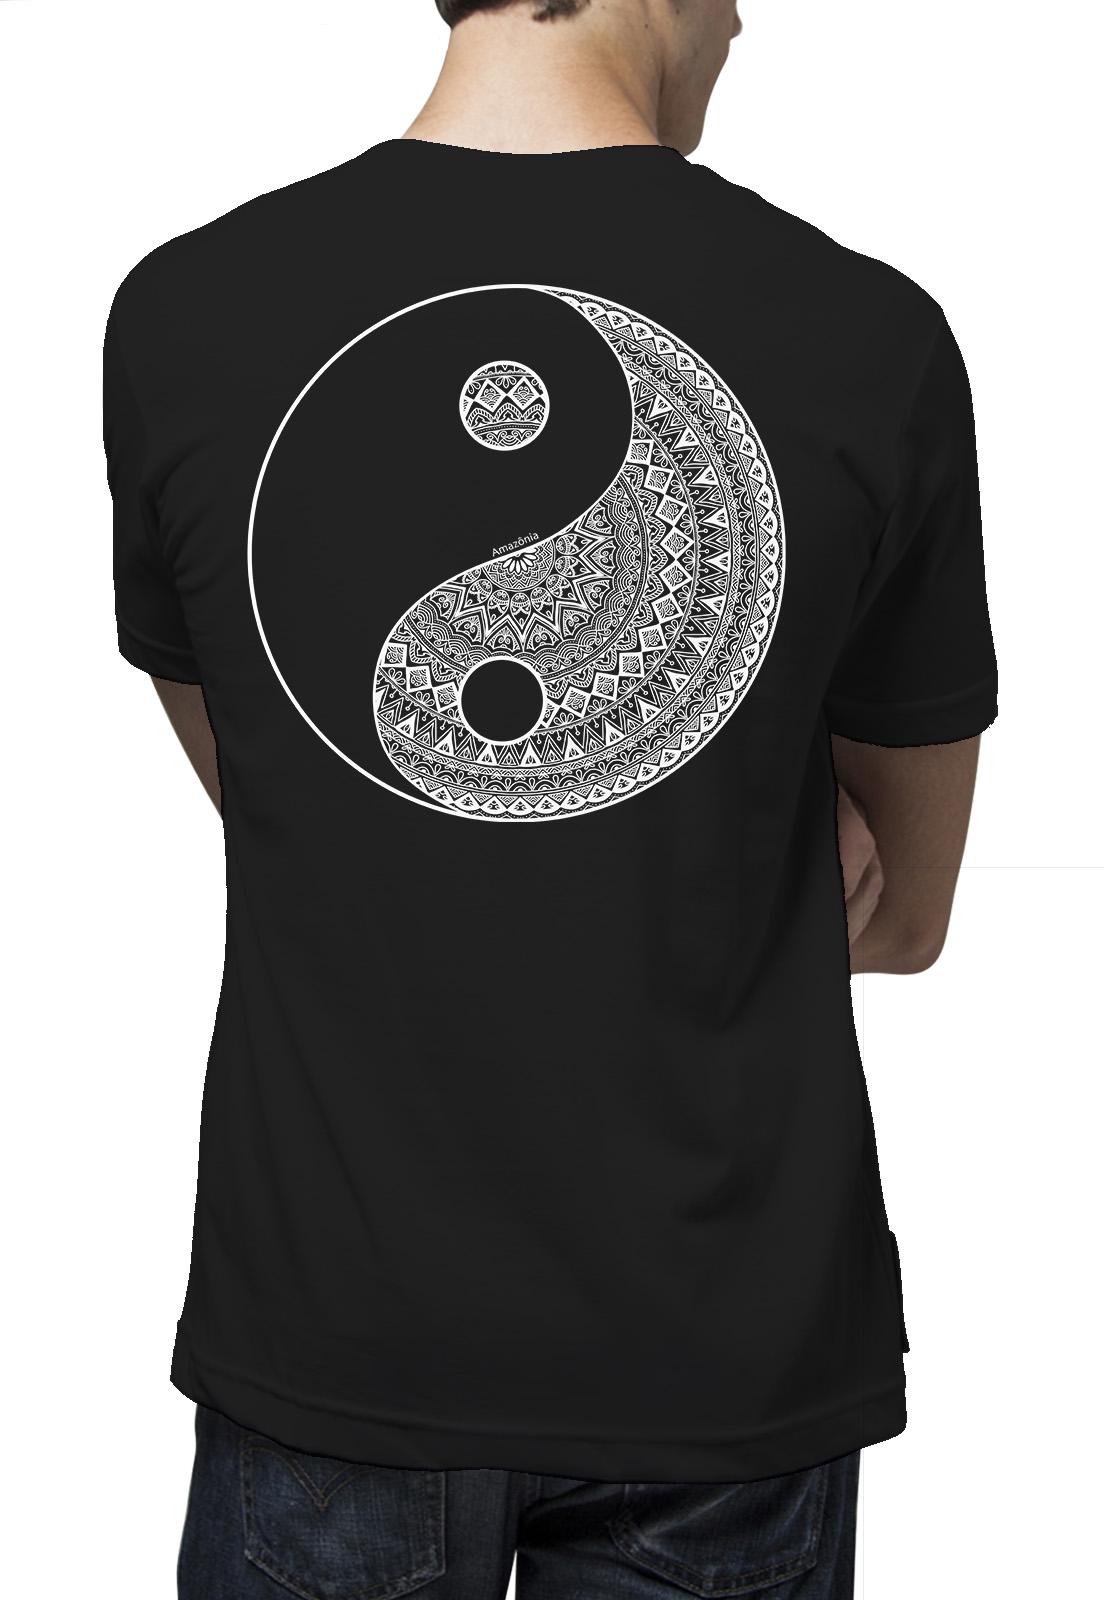 Camiseta Amazônia Yin Yang Tribal - Preto